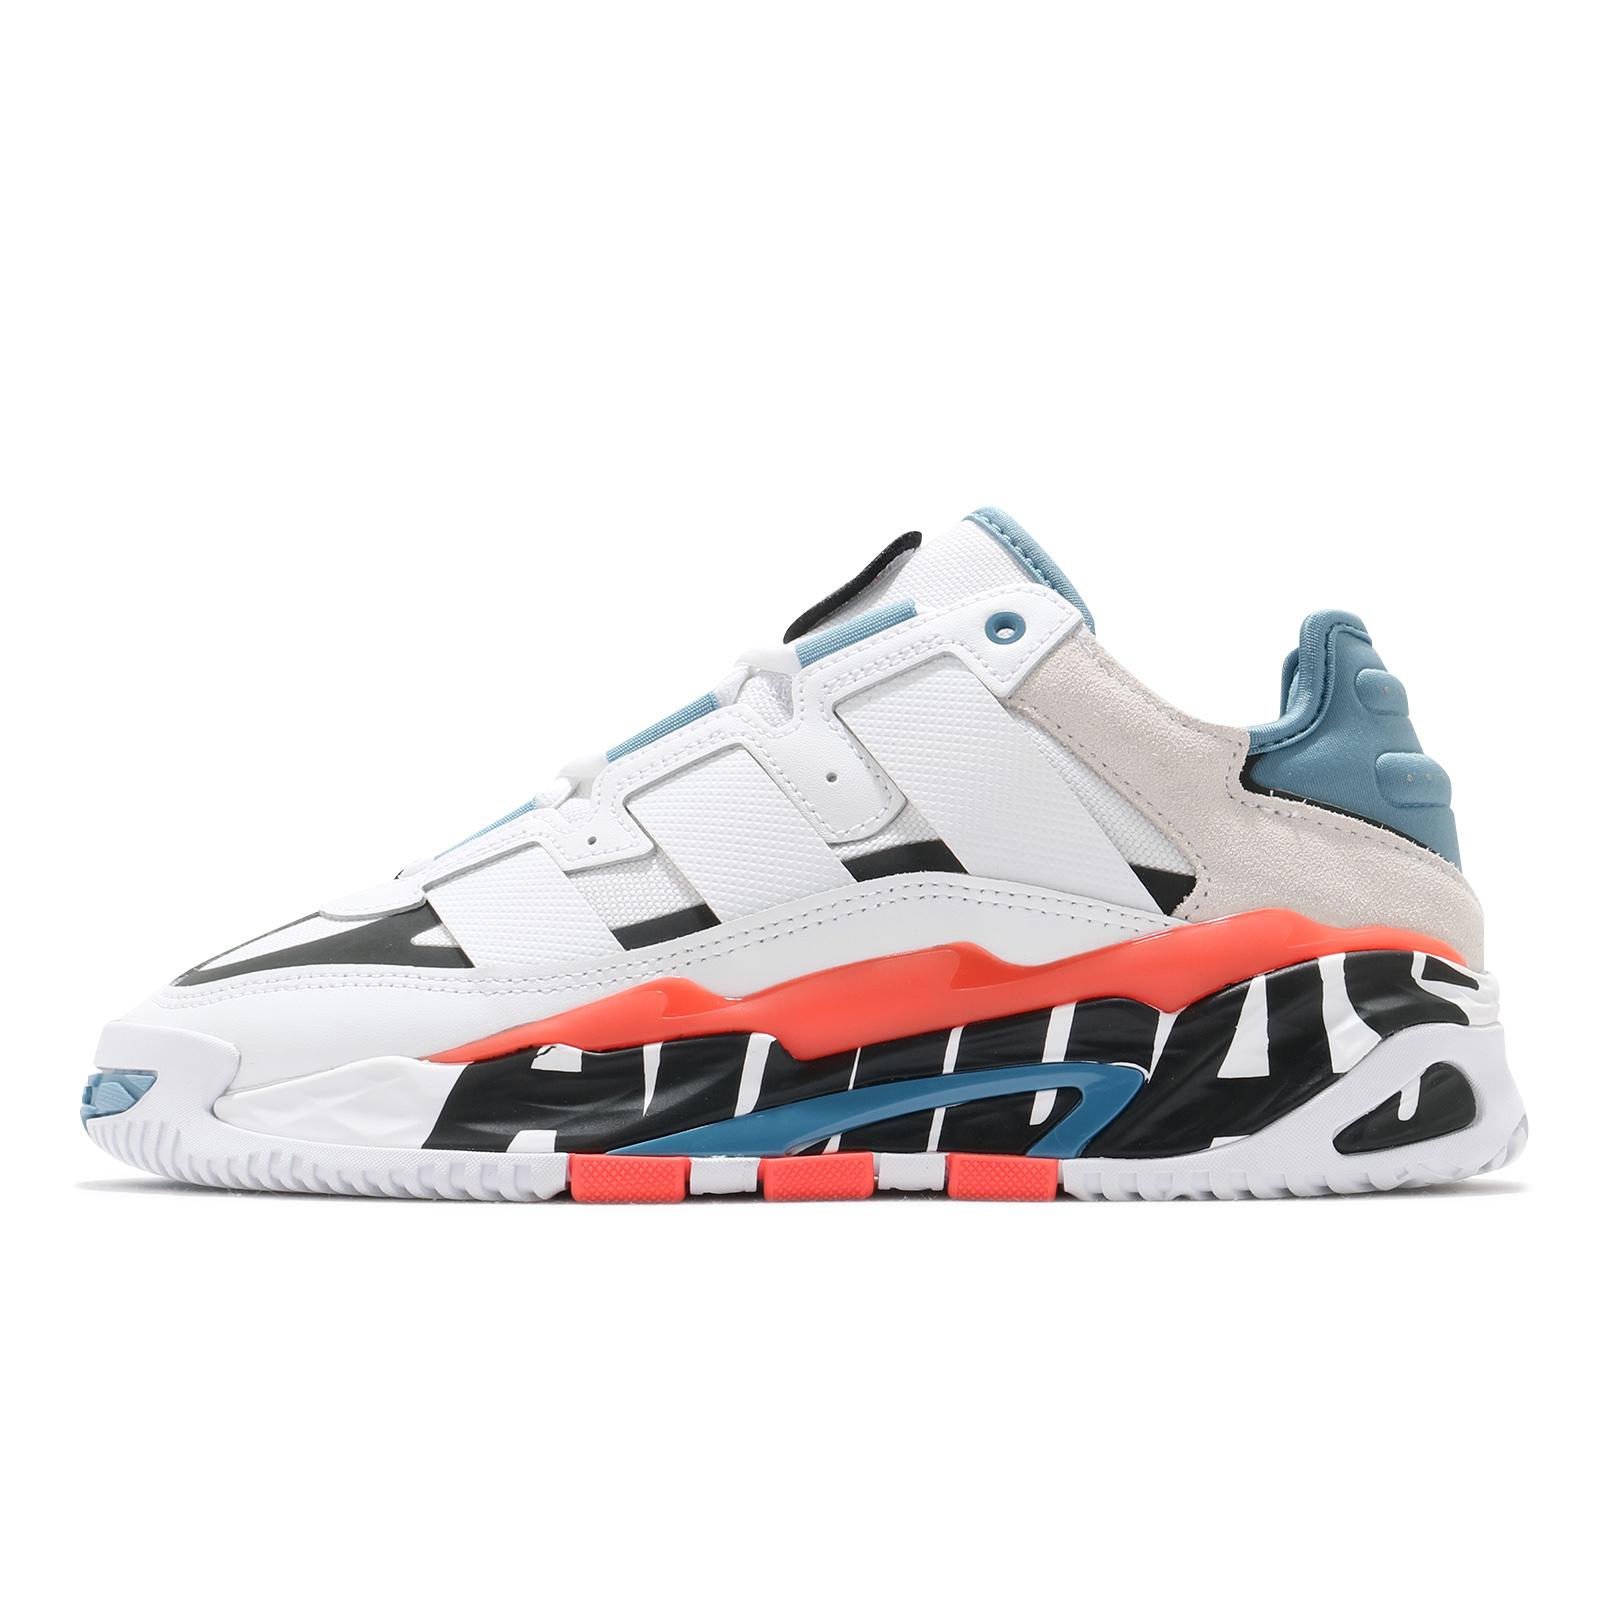 adidas 休閒鞋 Niteball 白 藍 橘 復古 三葉草 愛迪達 男鞋 鞋舌魔鬼氈【ACS】 FX7644